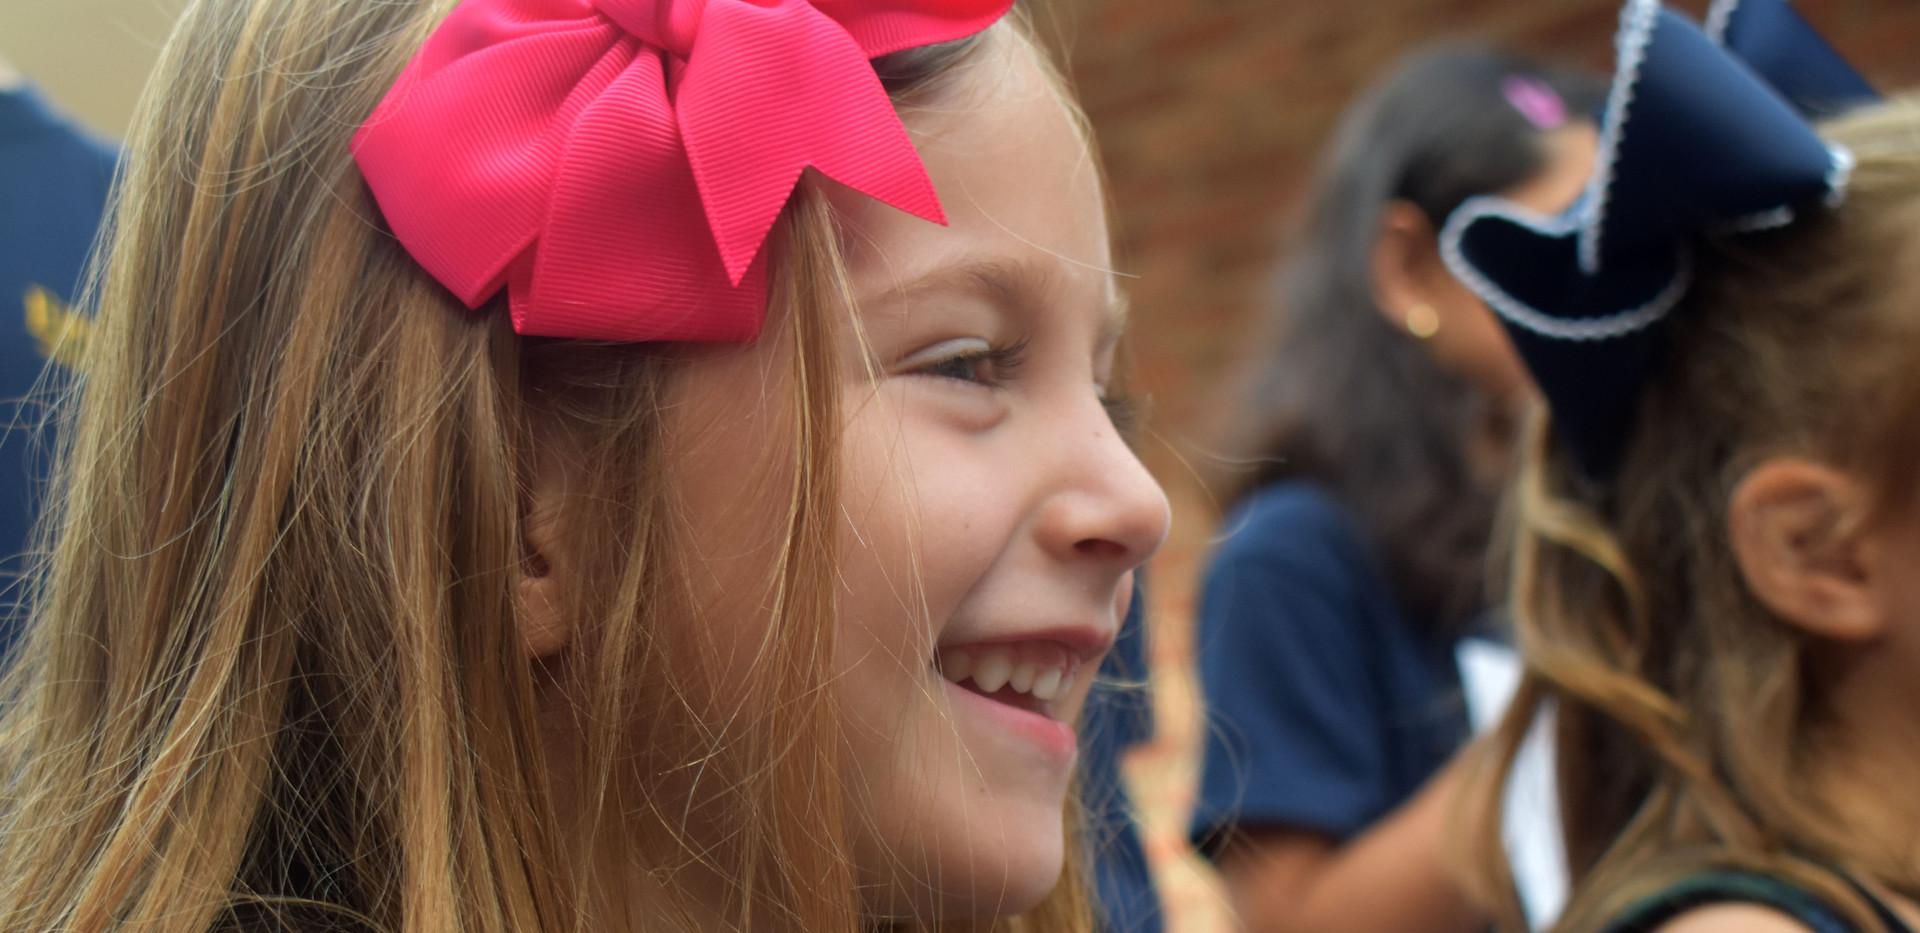 meredith girl smiling emotion.JPG